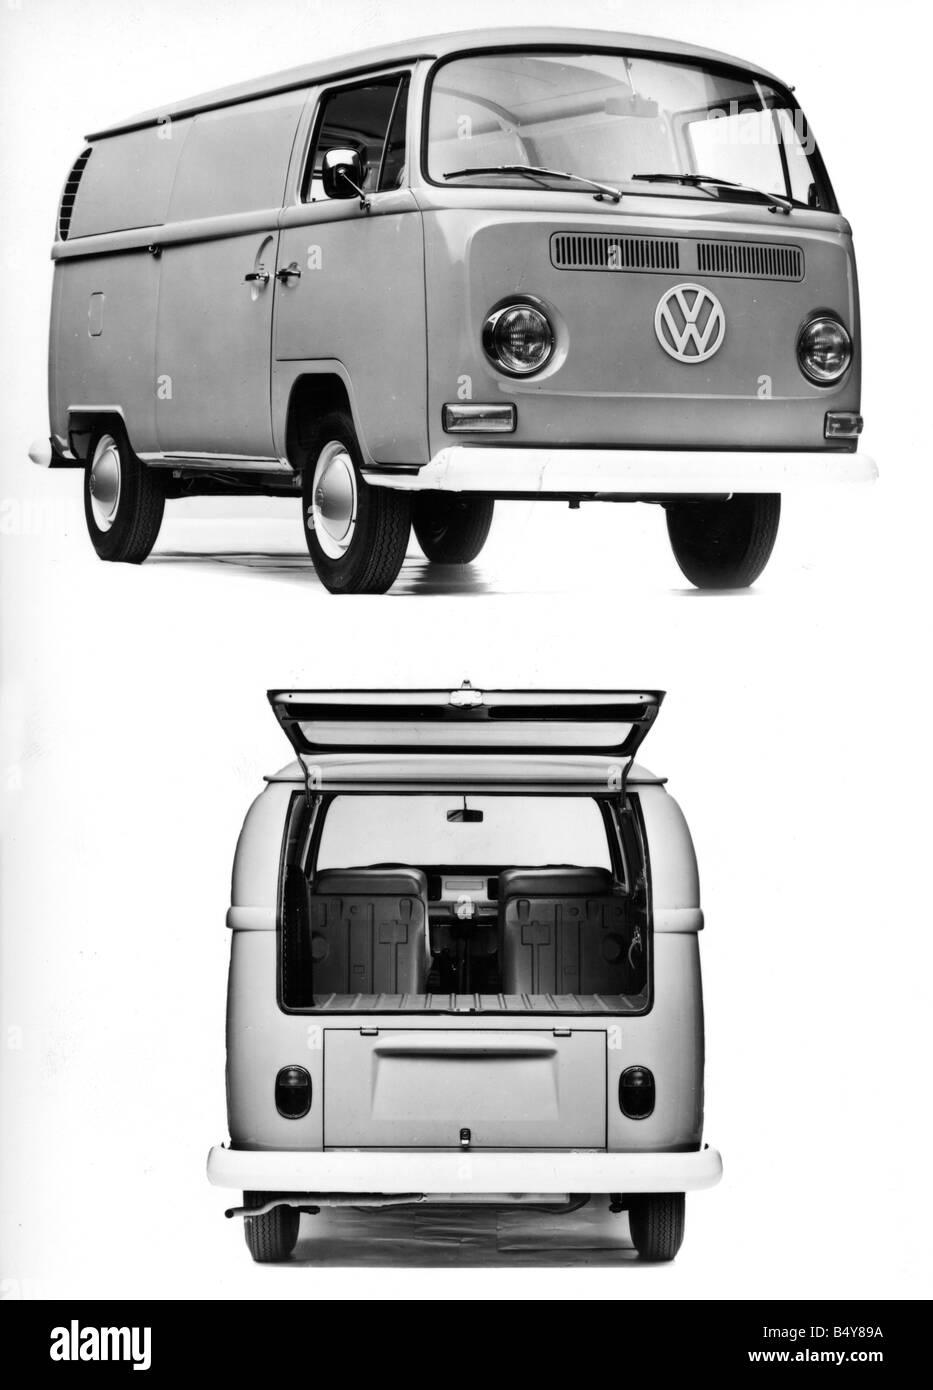 transport / transportation, car, vehicle variants, Volkswagen, VW Type 2, Transporter, frontal and back view of - Stock Image